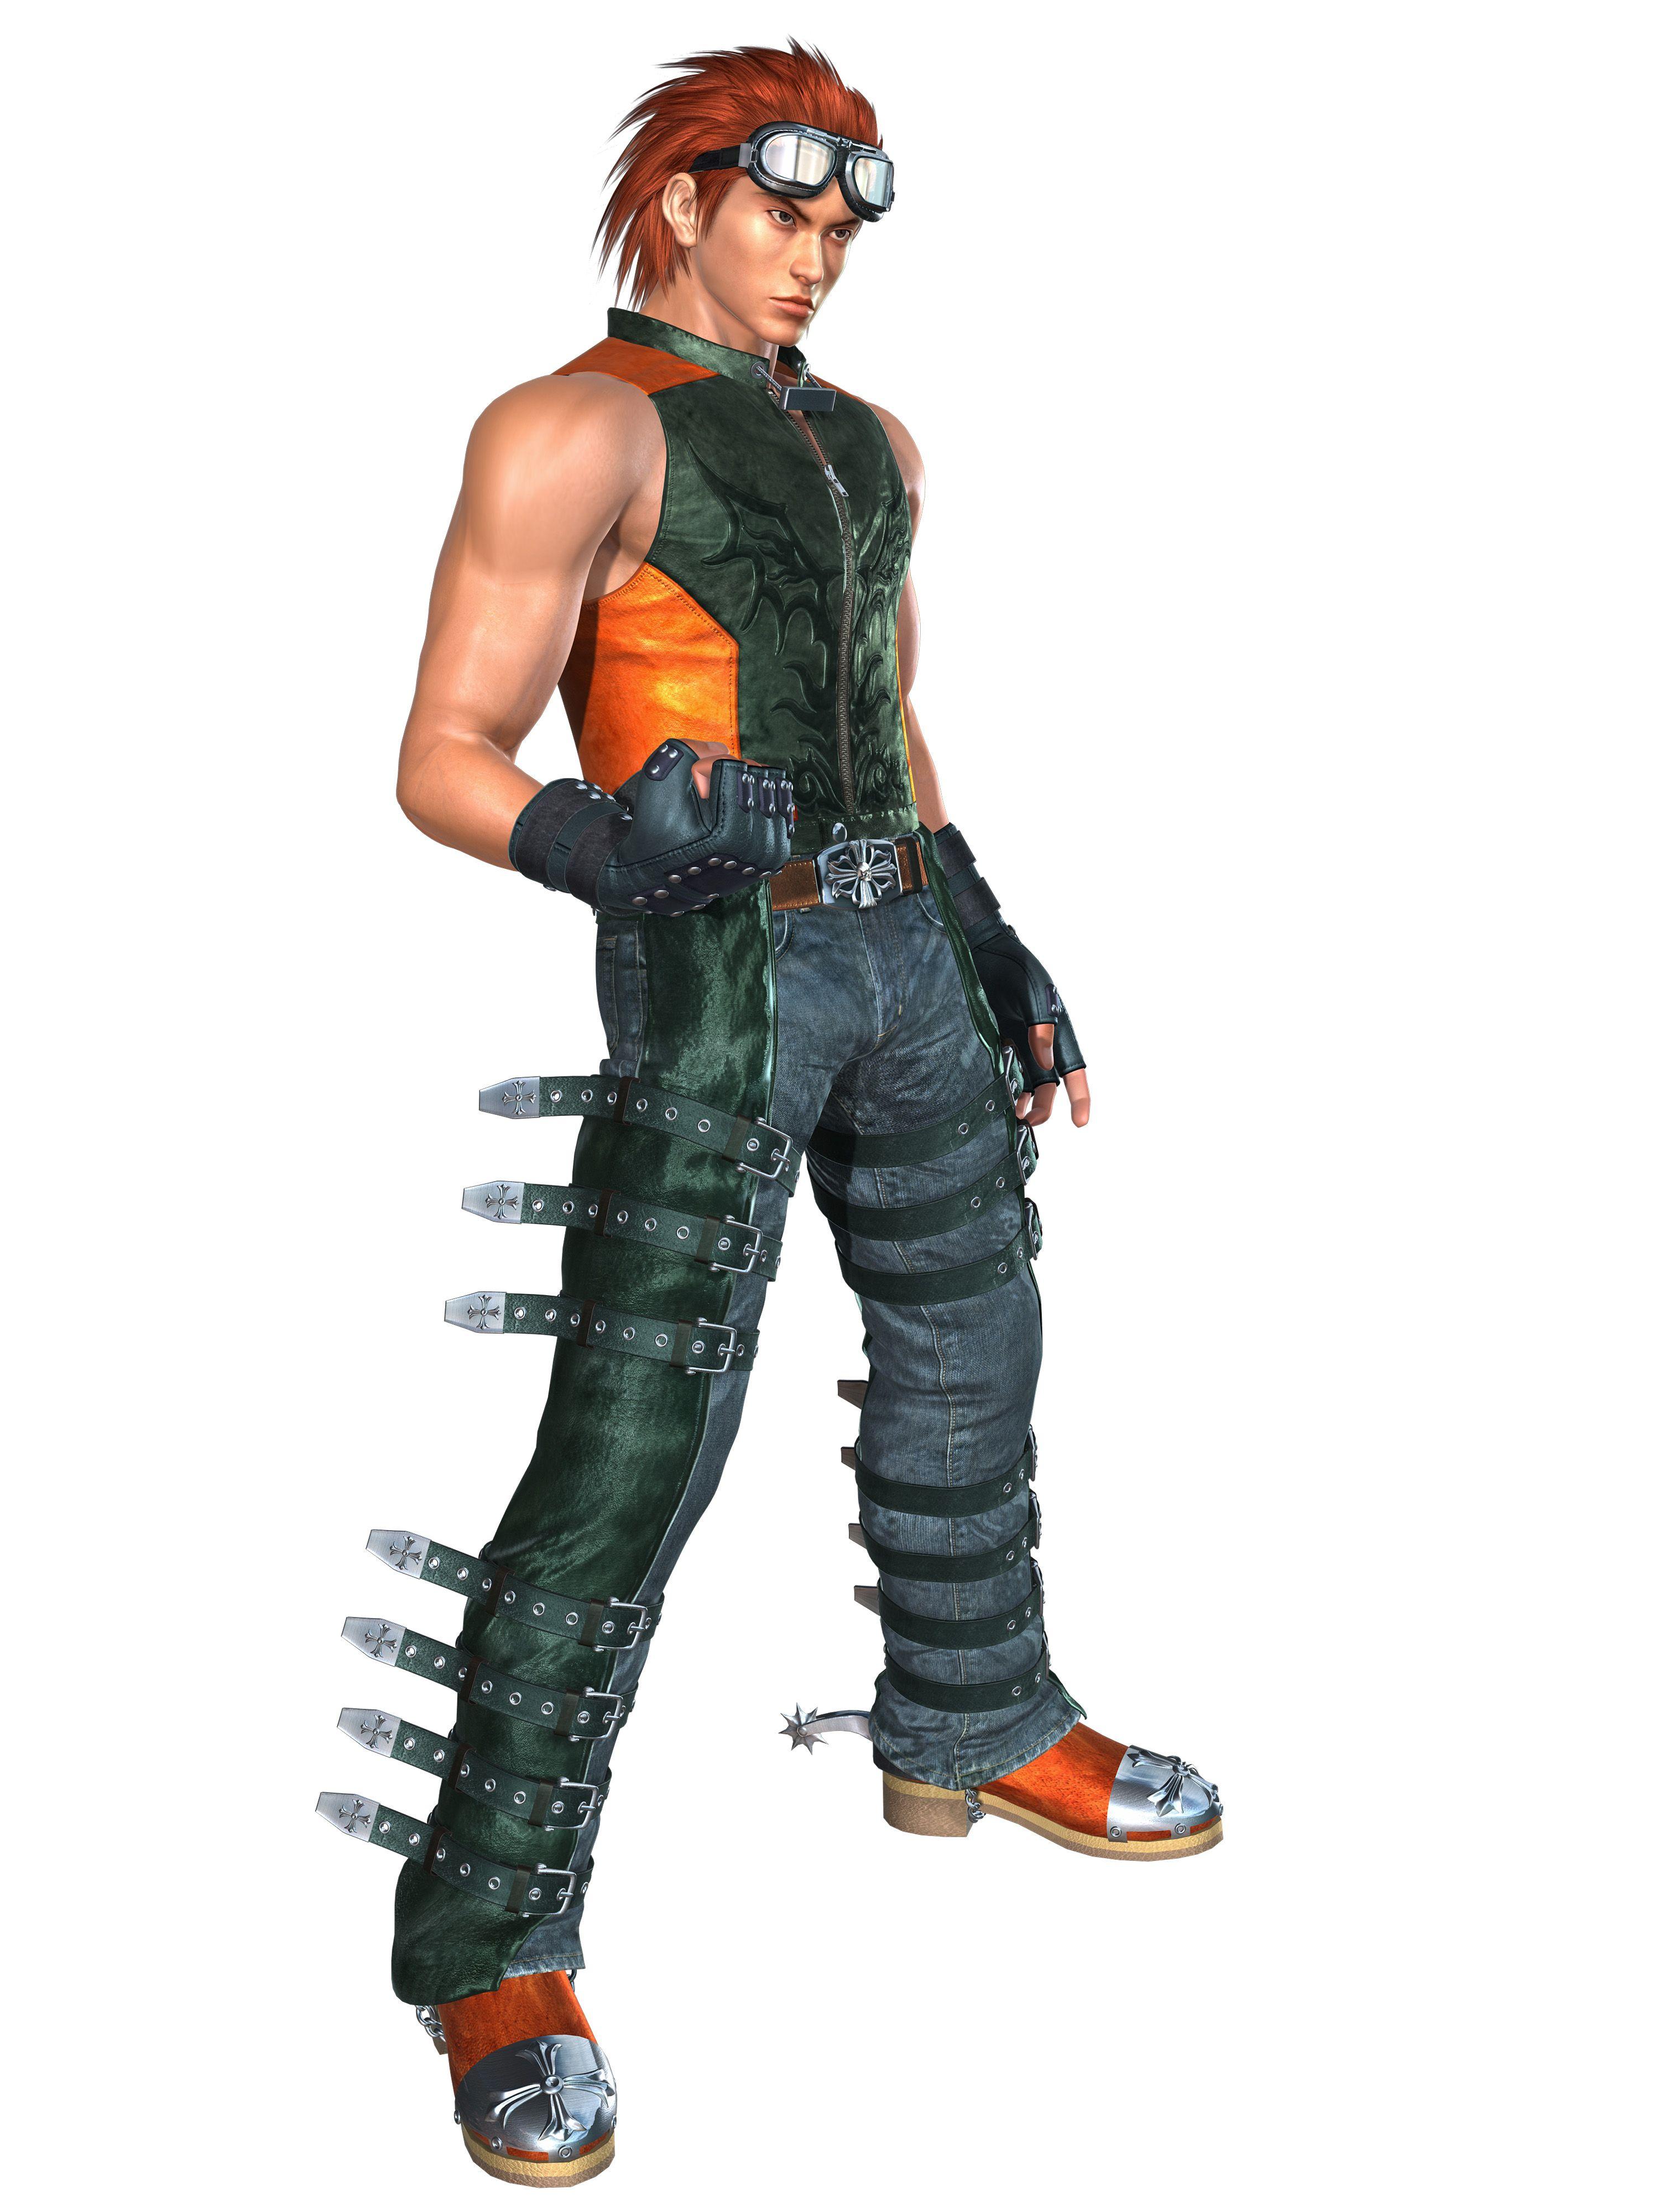 Hwoarang   Street fighter tekken, Street fighter and Japanese